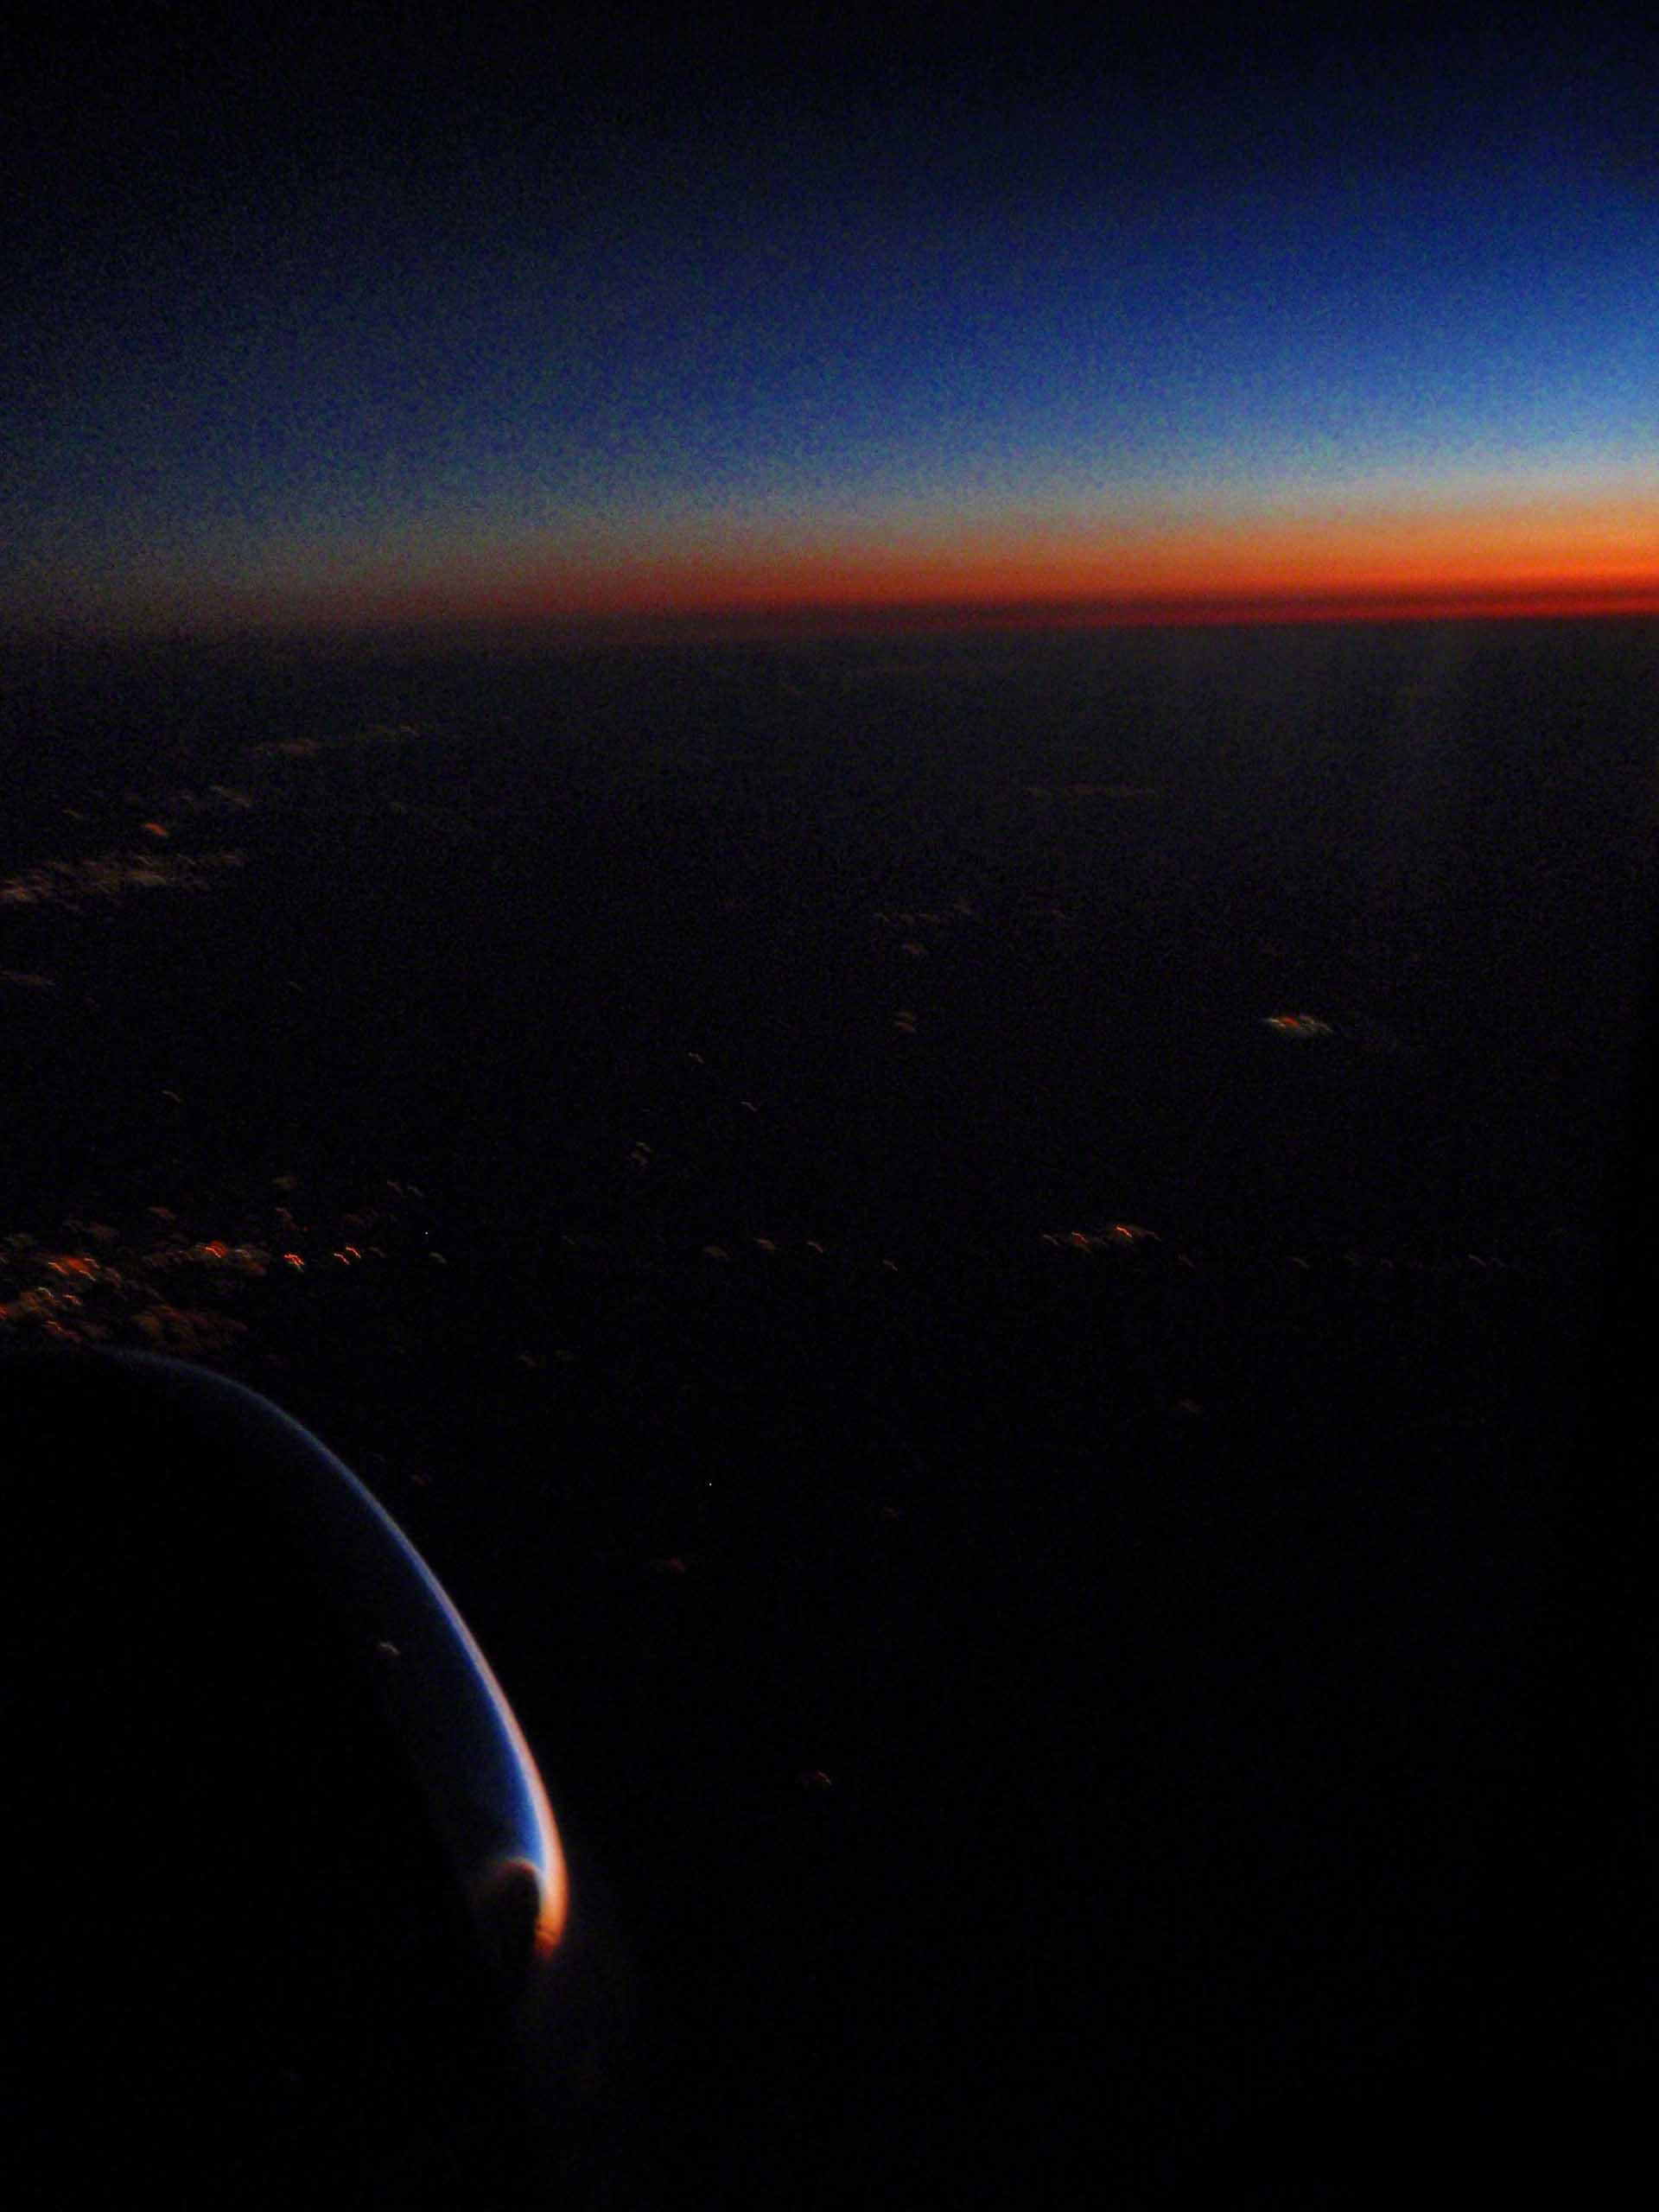 AirplaneSunset.jpg